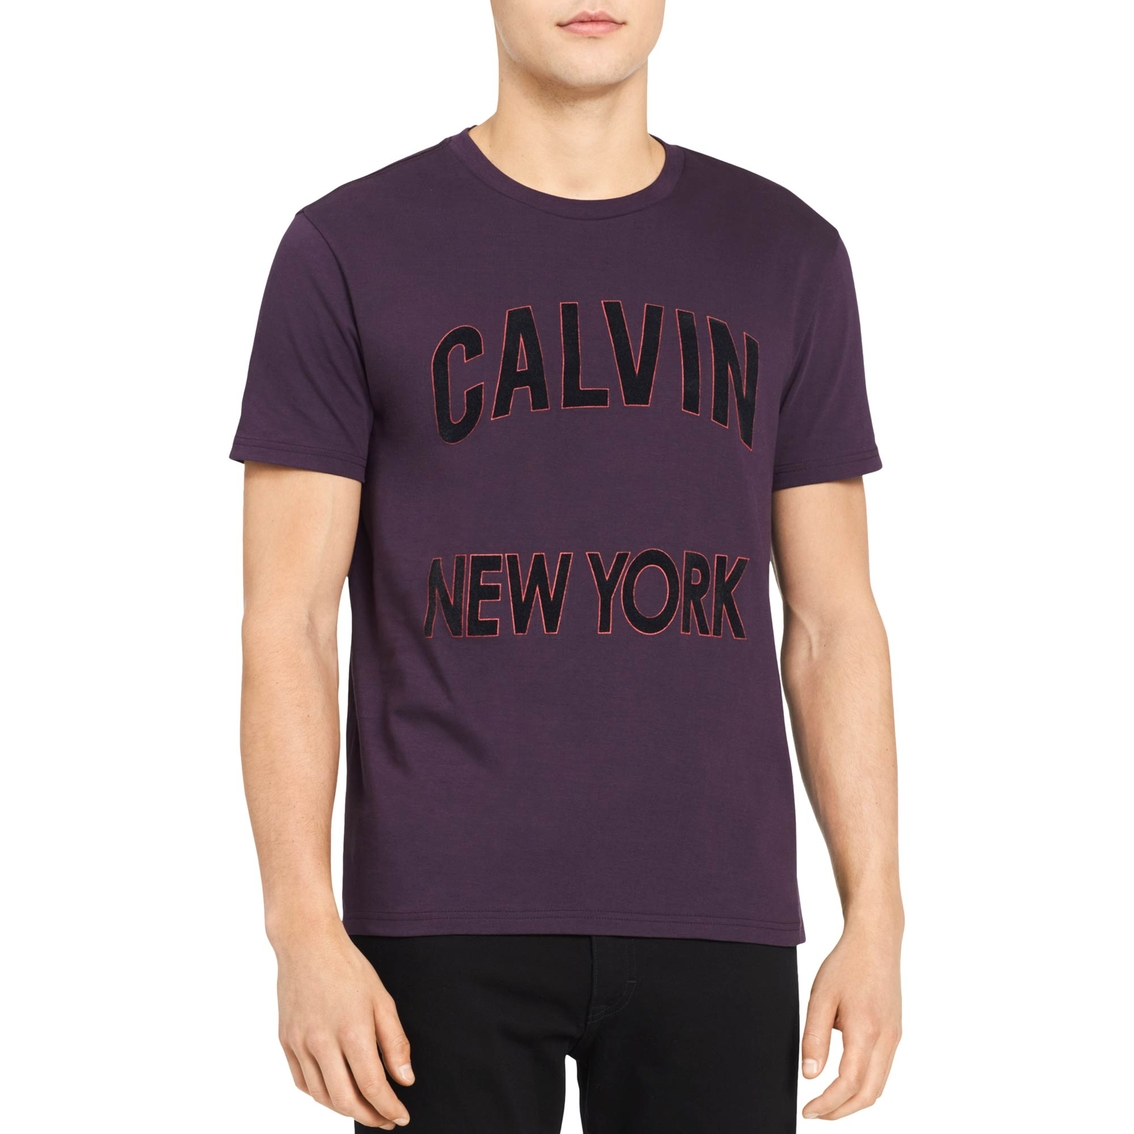 Calvin Klein Jeans Ck New York Crew Neck Tee  0b500f77b21